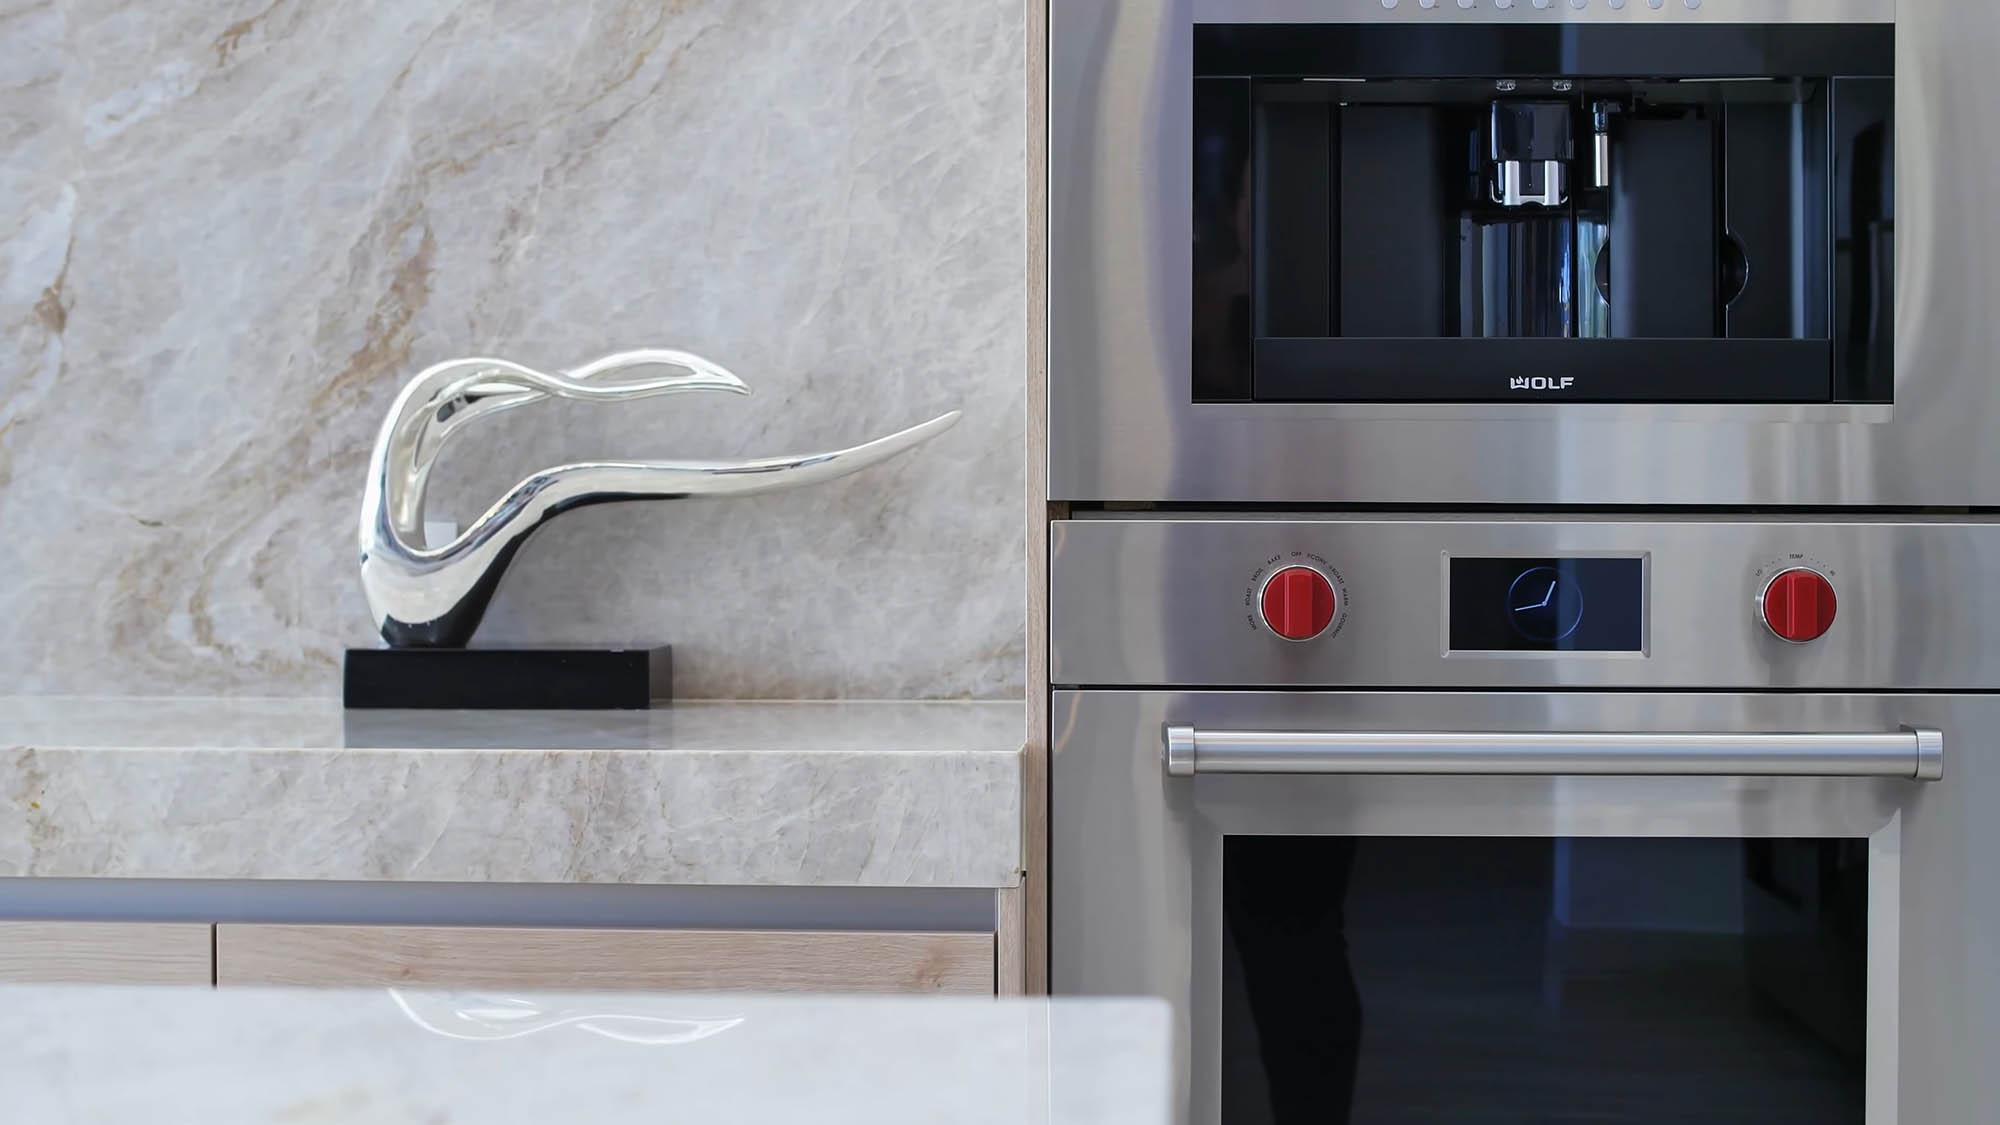 Modern luxury kitchen with solid stone slab backsplash. modern home design details.